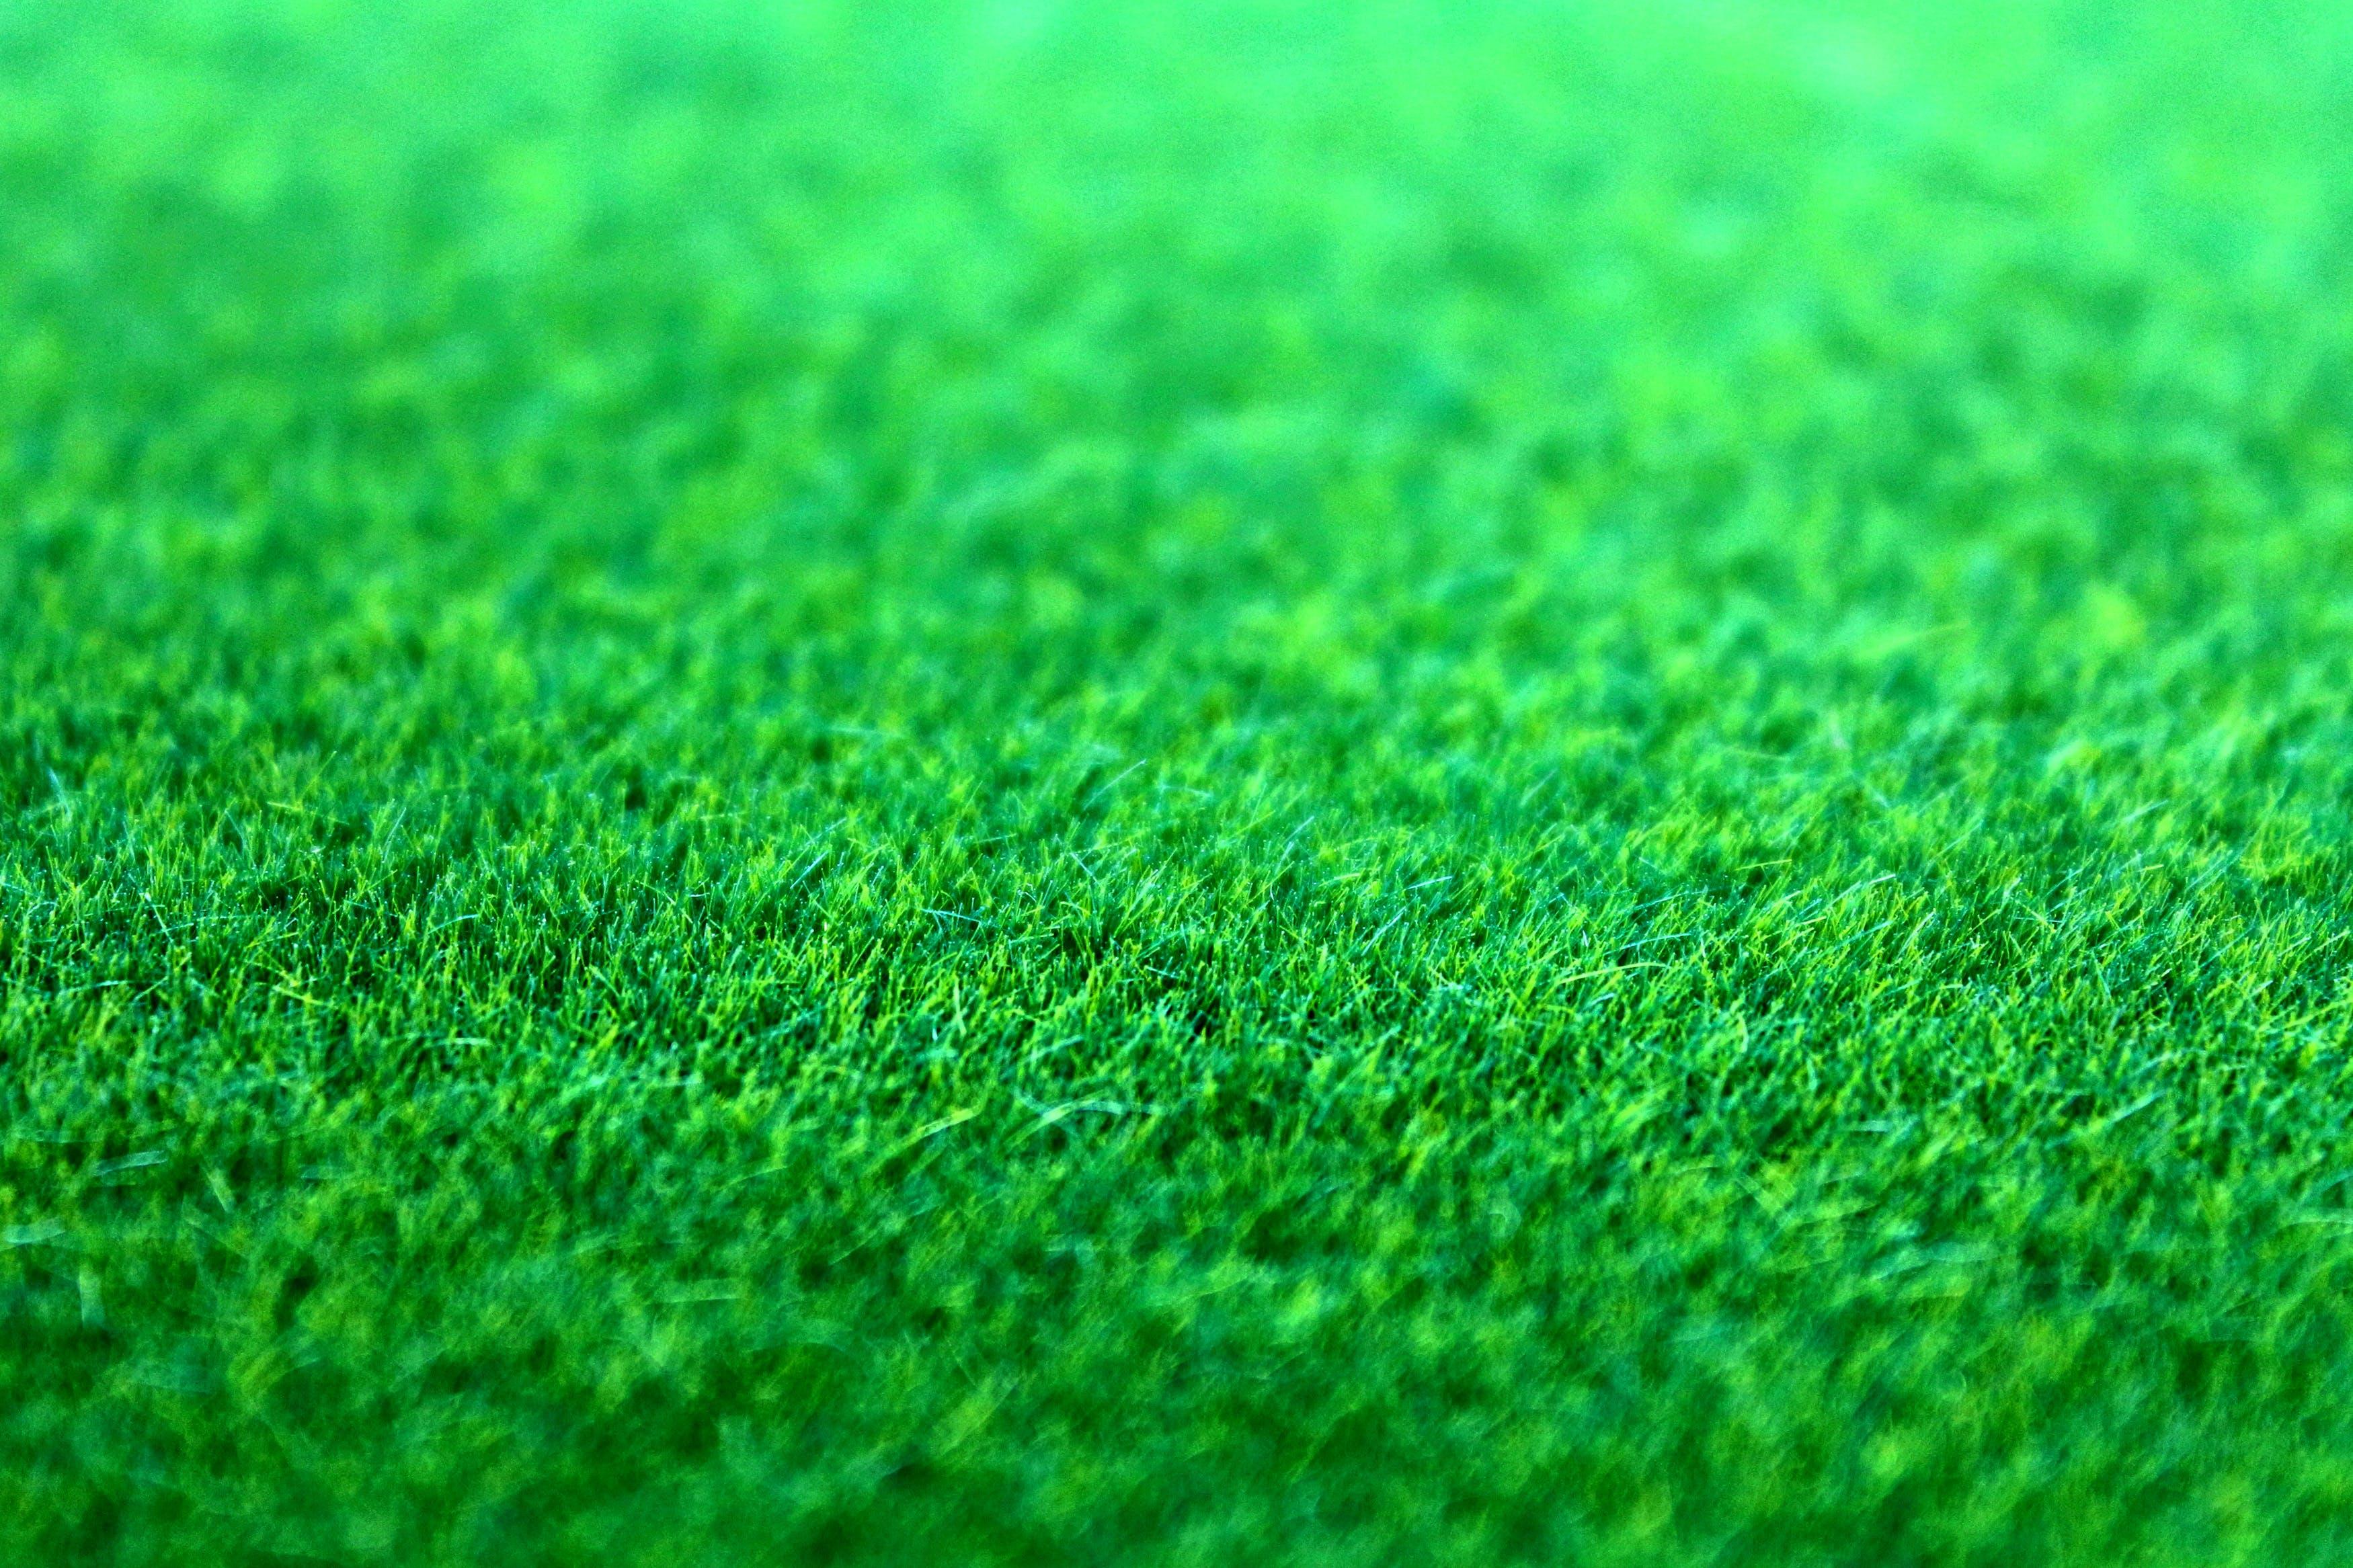 Kostenloses Stock Foto zu boden, feld, gras, grün